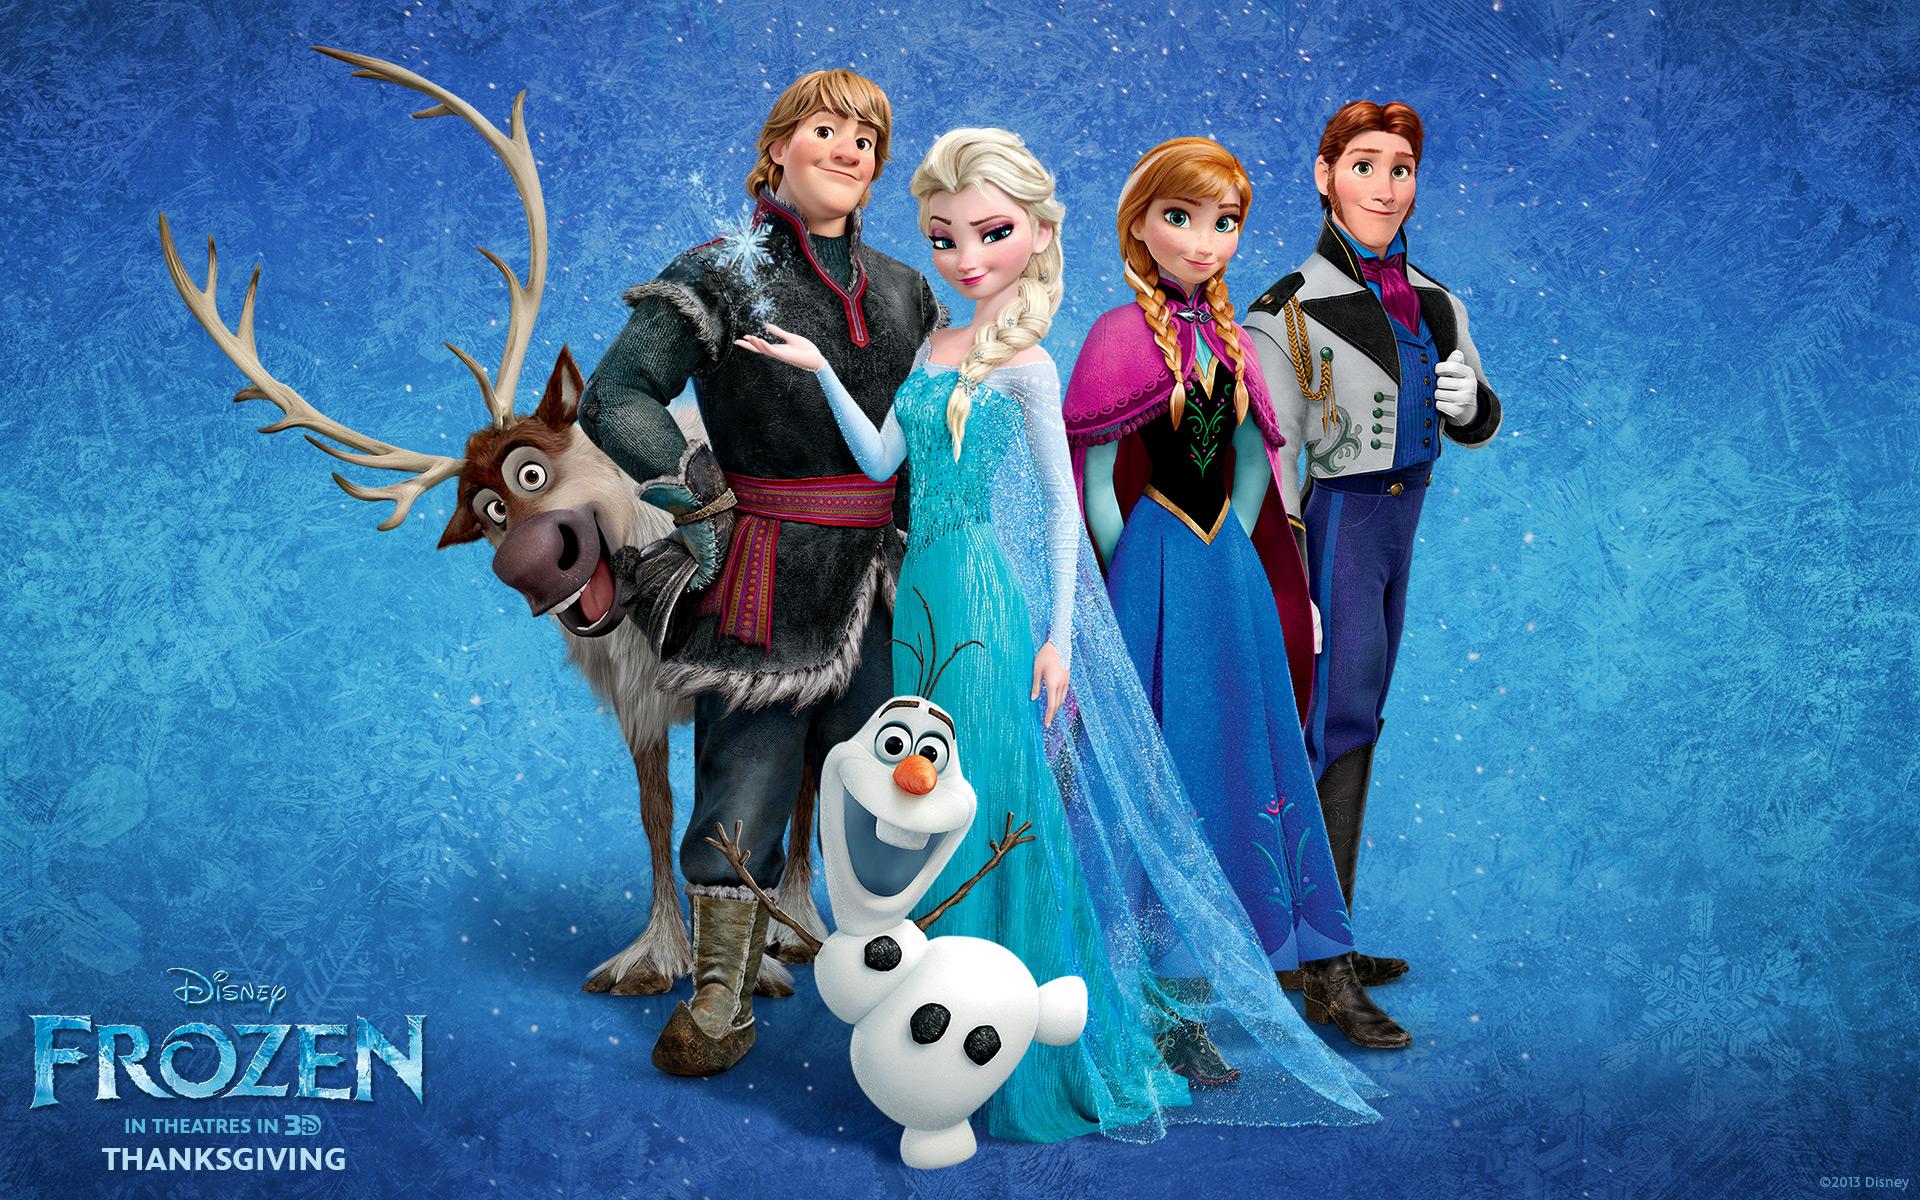 Frozen 2013 Movie Wallpapers Wallpapers HD 1920x1200